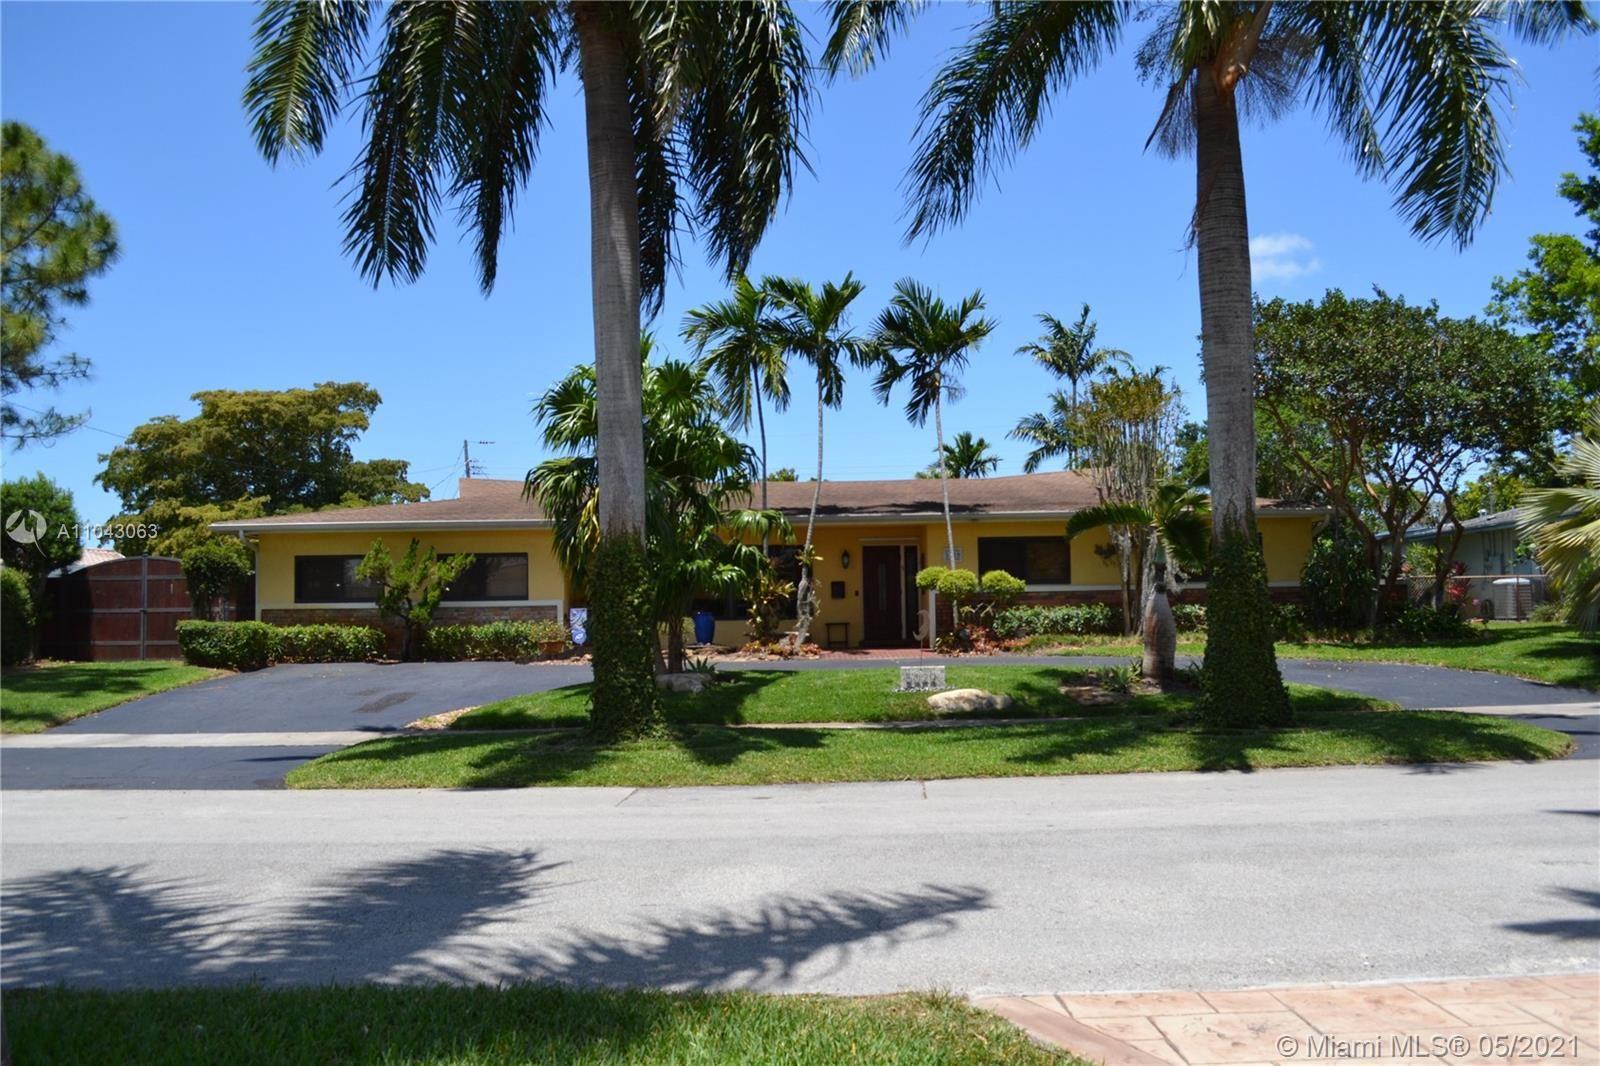 5029 Polk St, Hollywood, FL 33021 - #: A11043063